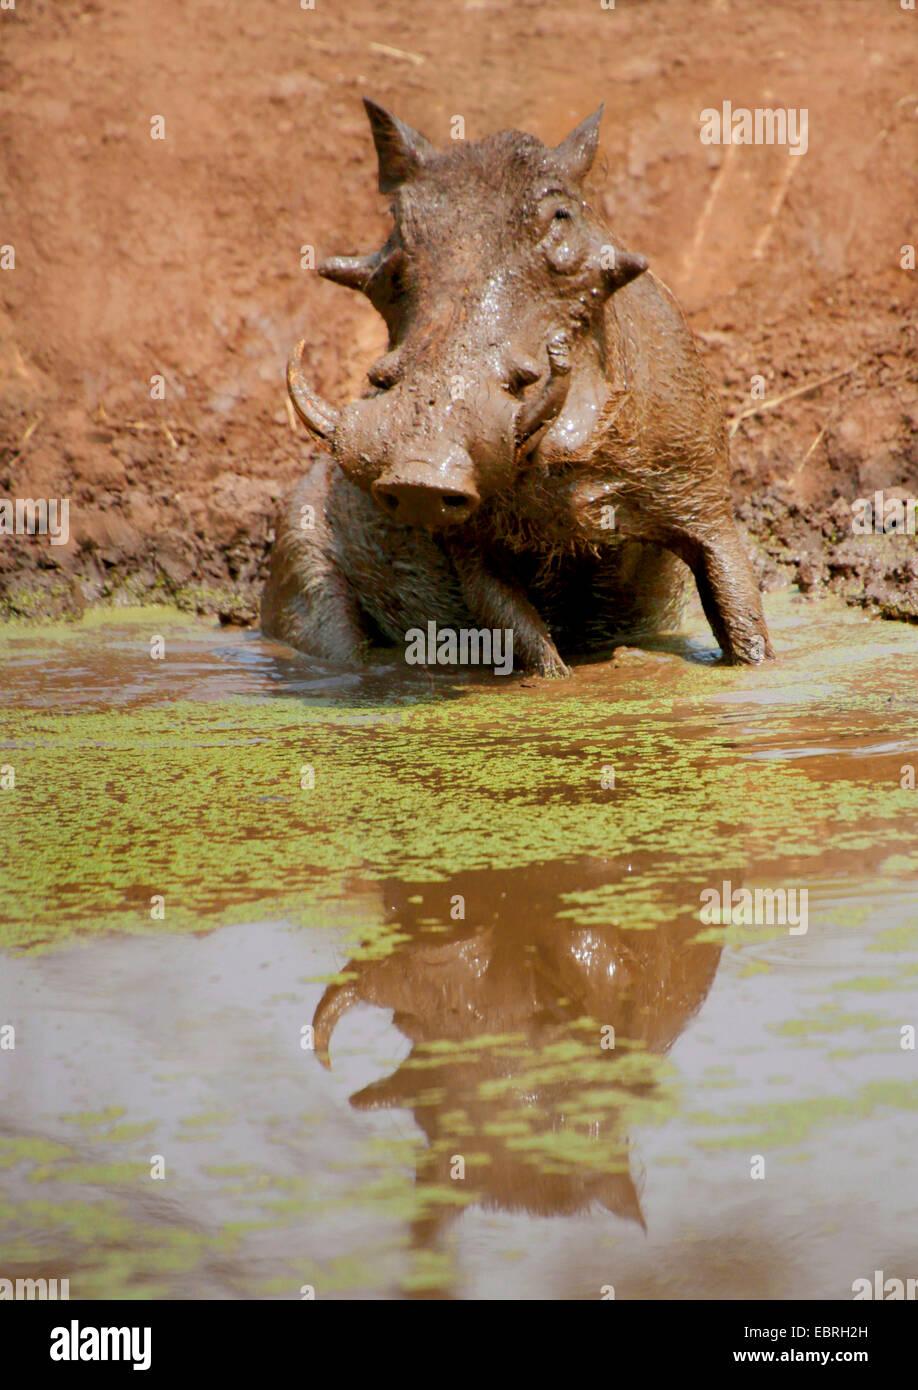 common warthog, savanna warthog (Phacochoerus africanus), at a water hole, Kenya - Stock Image